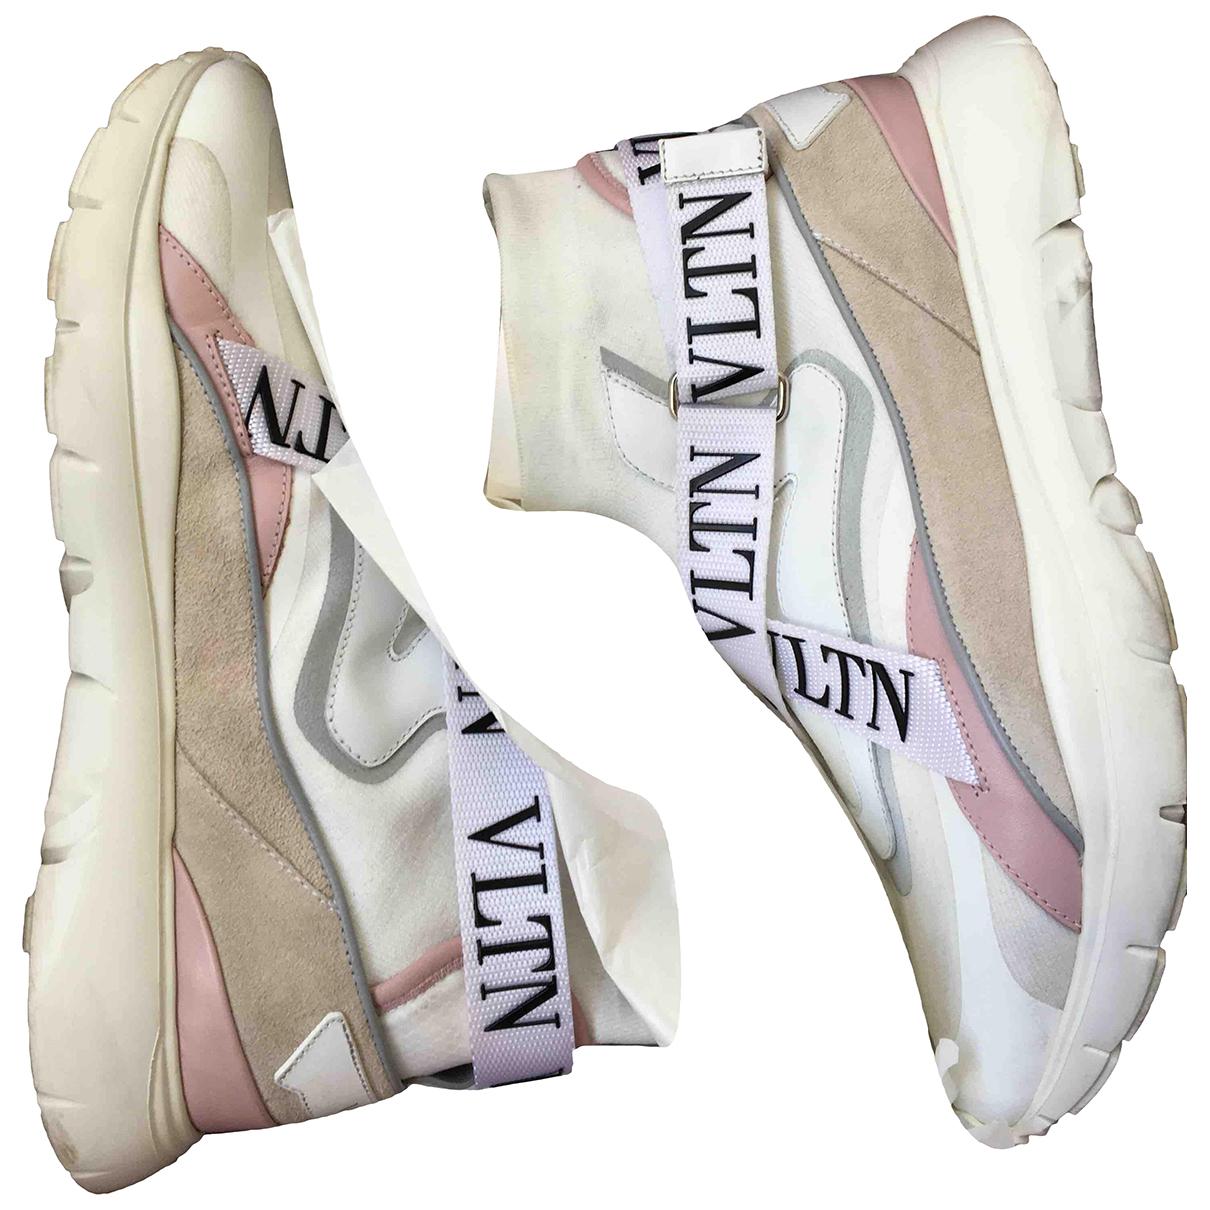 Valentino Garavani - Baskets Heroes VLTN pour femme en cuir - blanc